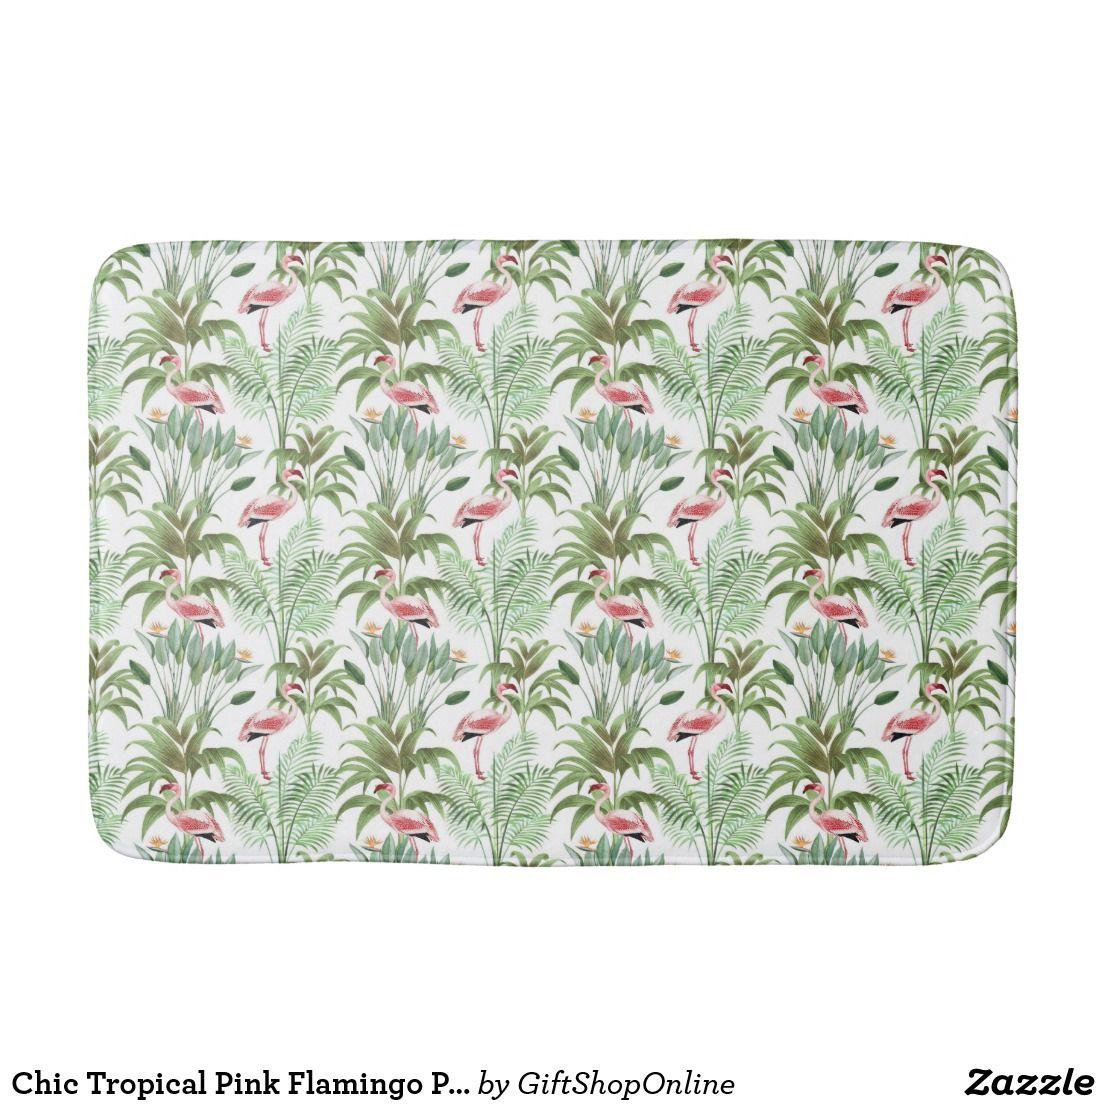 Chic Tropical Pink Flamingo Patterned Bathroom Mat | Zazzle Bathroom ...